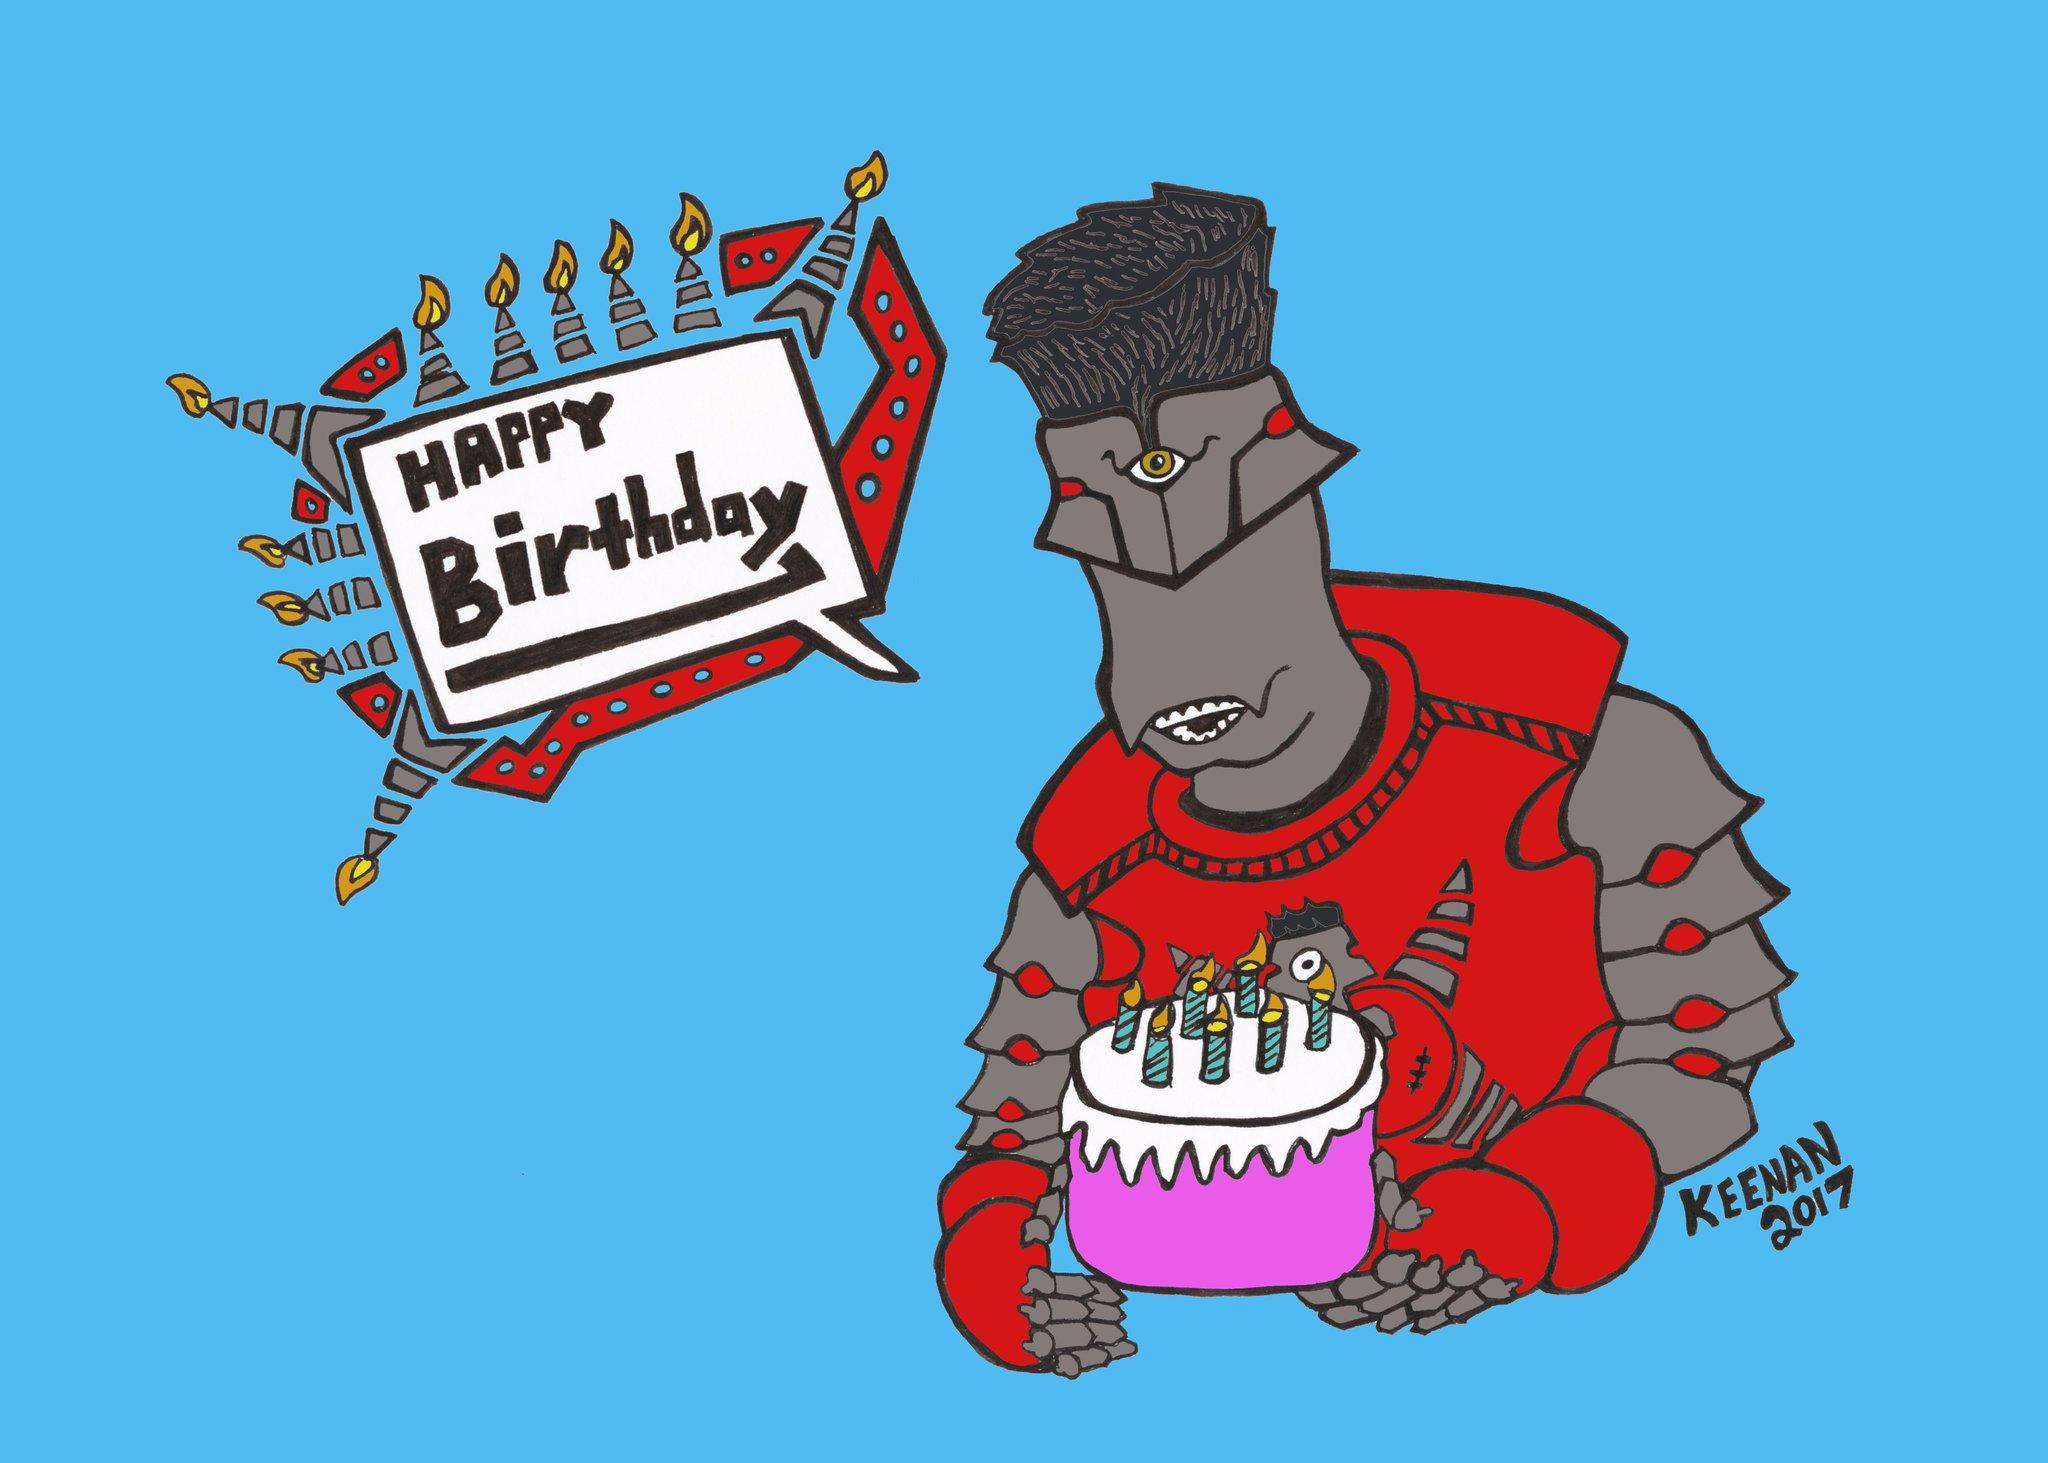 -- Happy Birthday, LL Cool J!